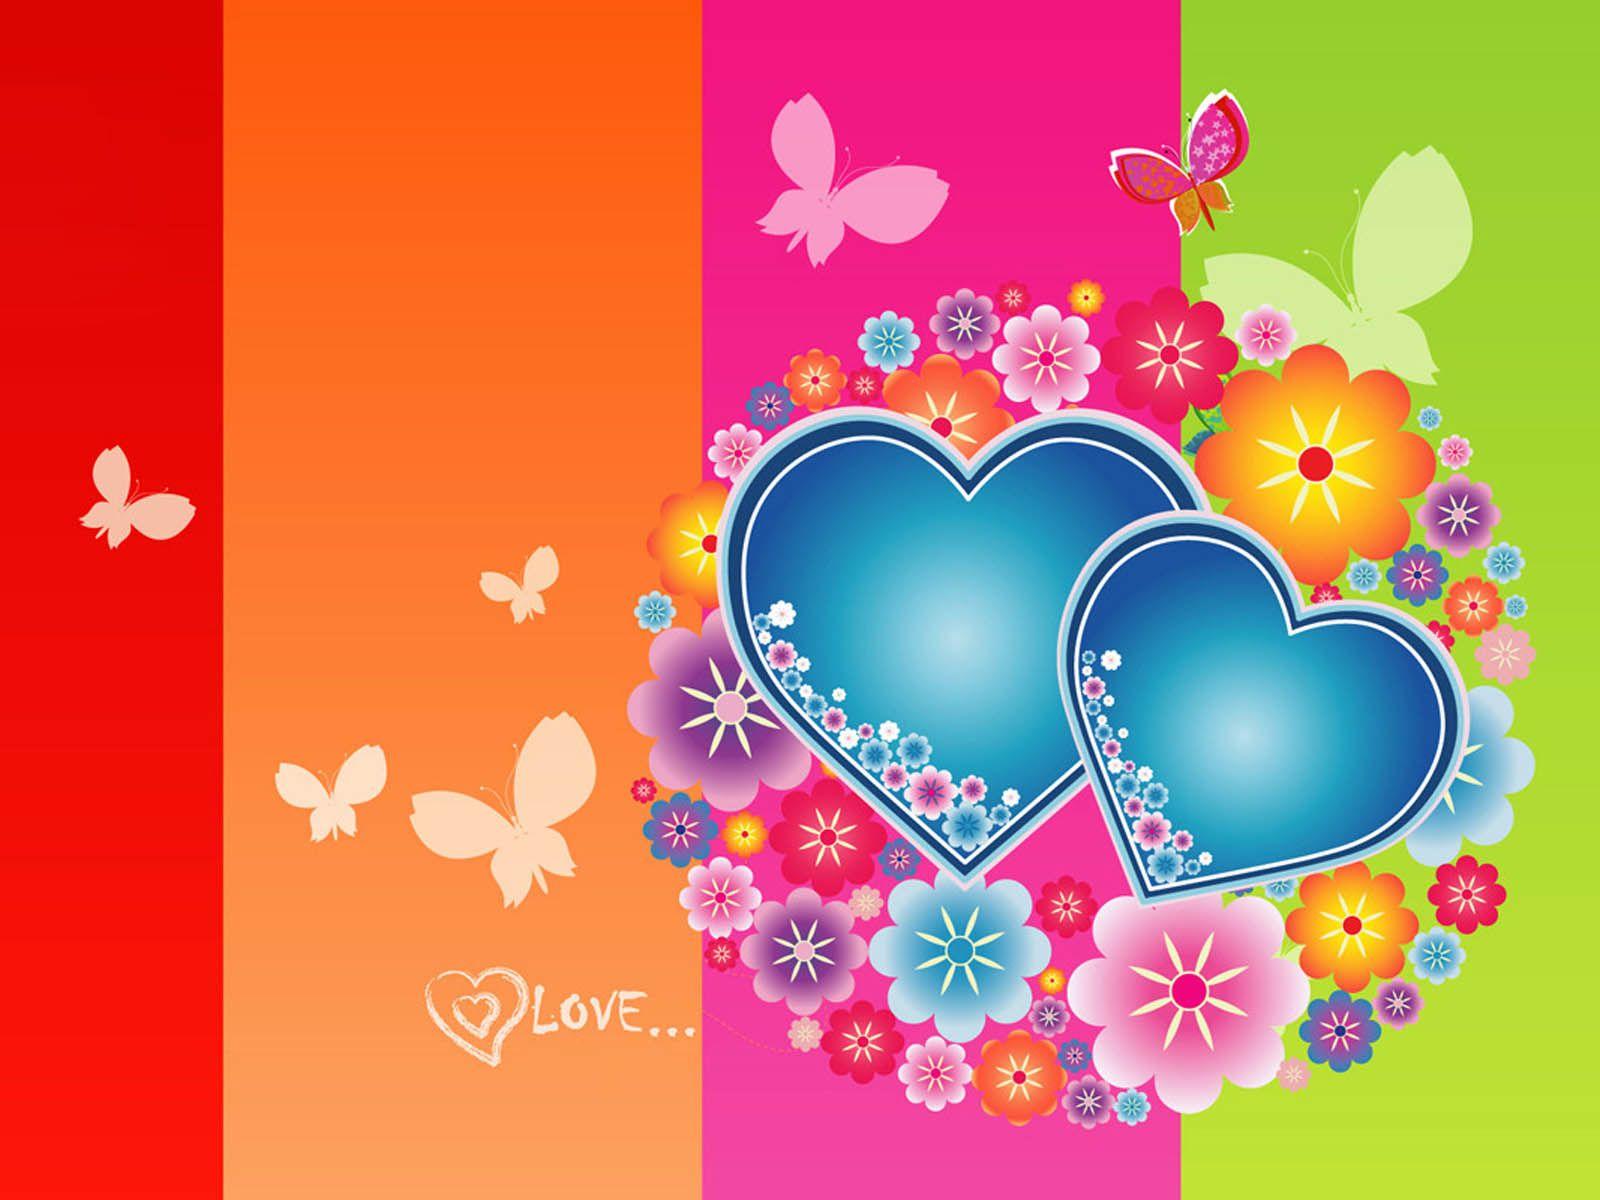 Love Heart Wallpaper 19